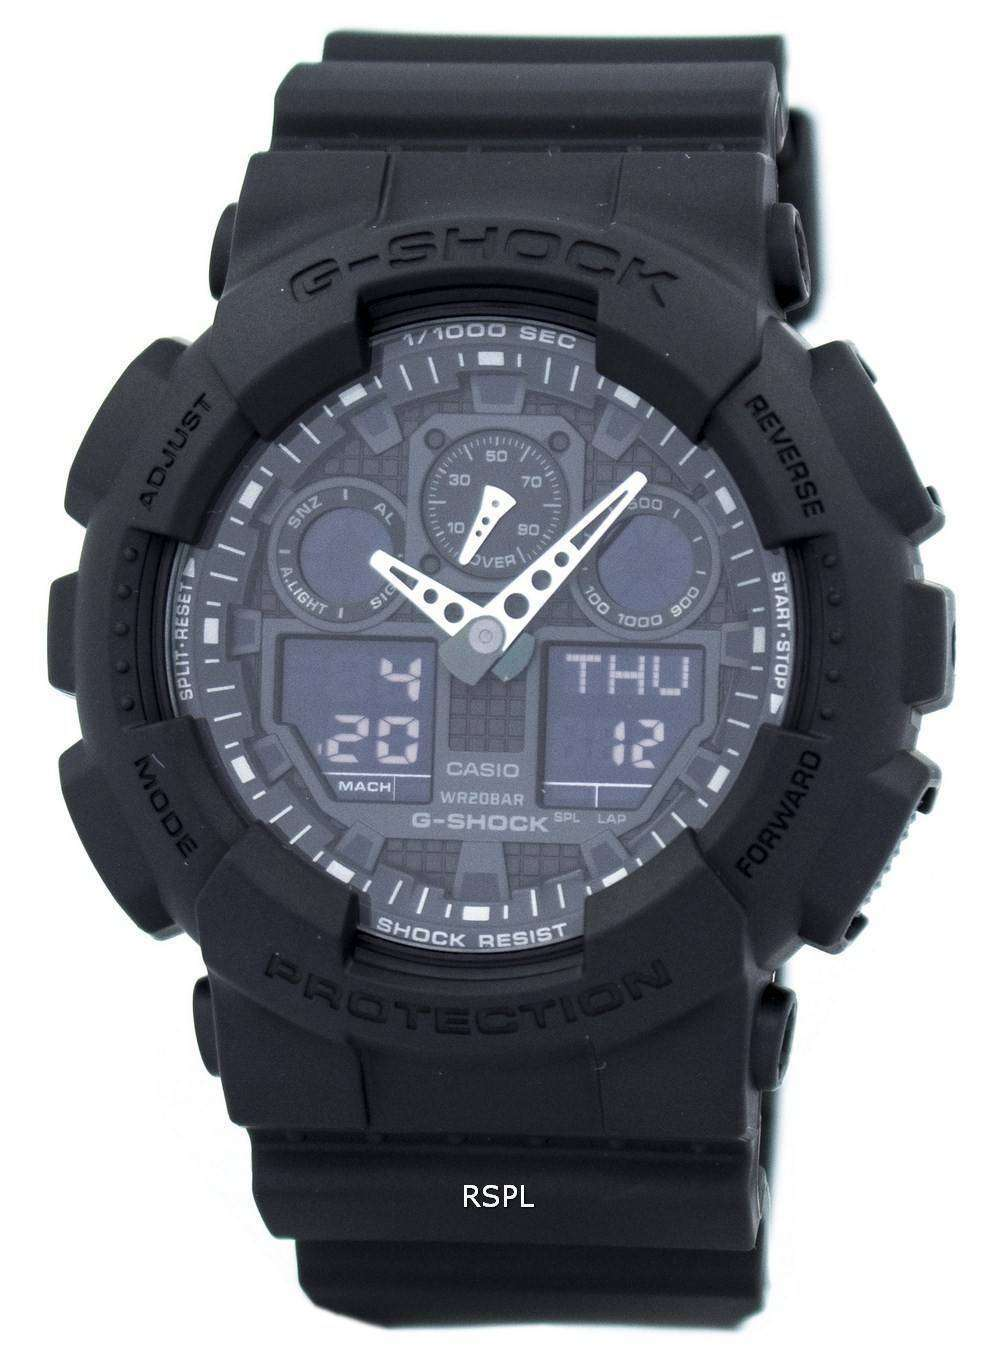 2a115416dc5b Casio G-Shock militar mate negro GA-100-1A1 hombres reloj ...